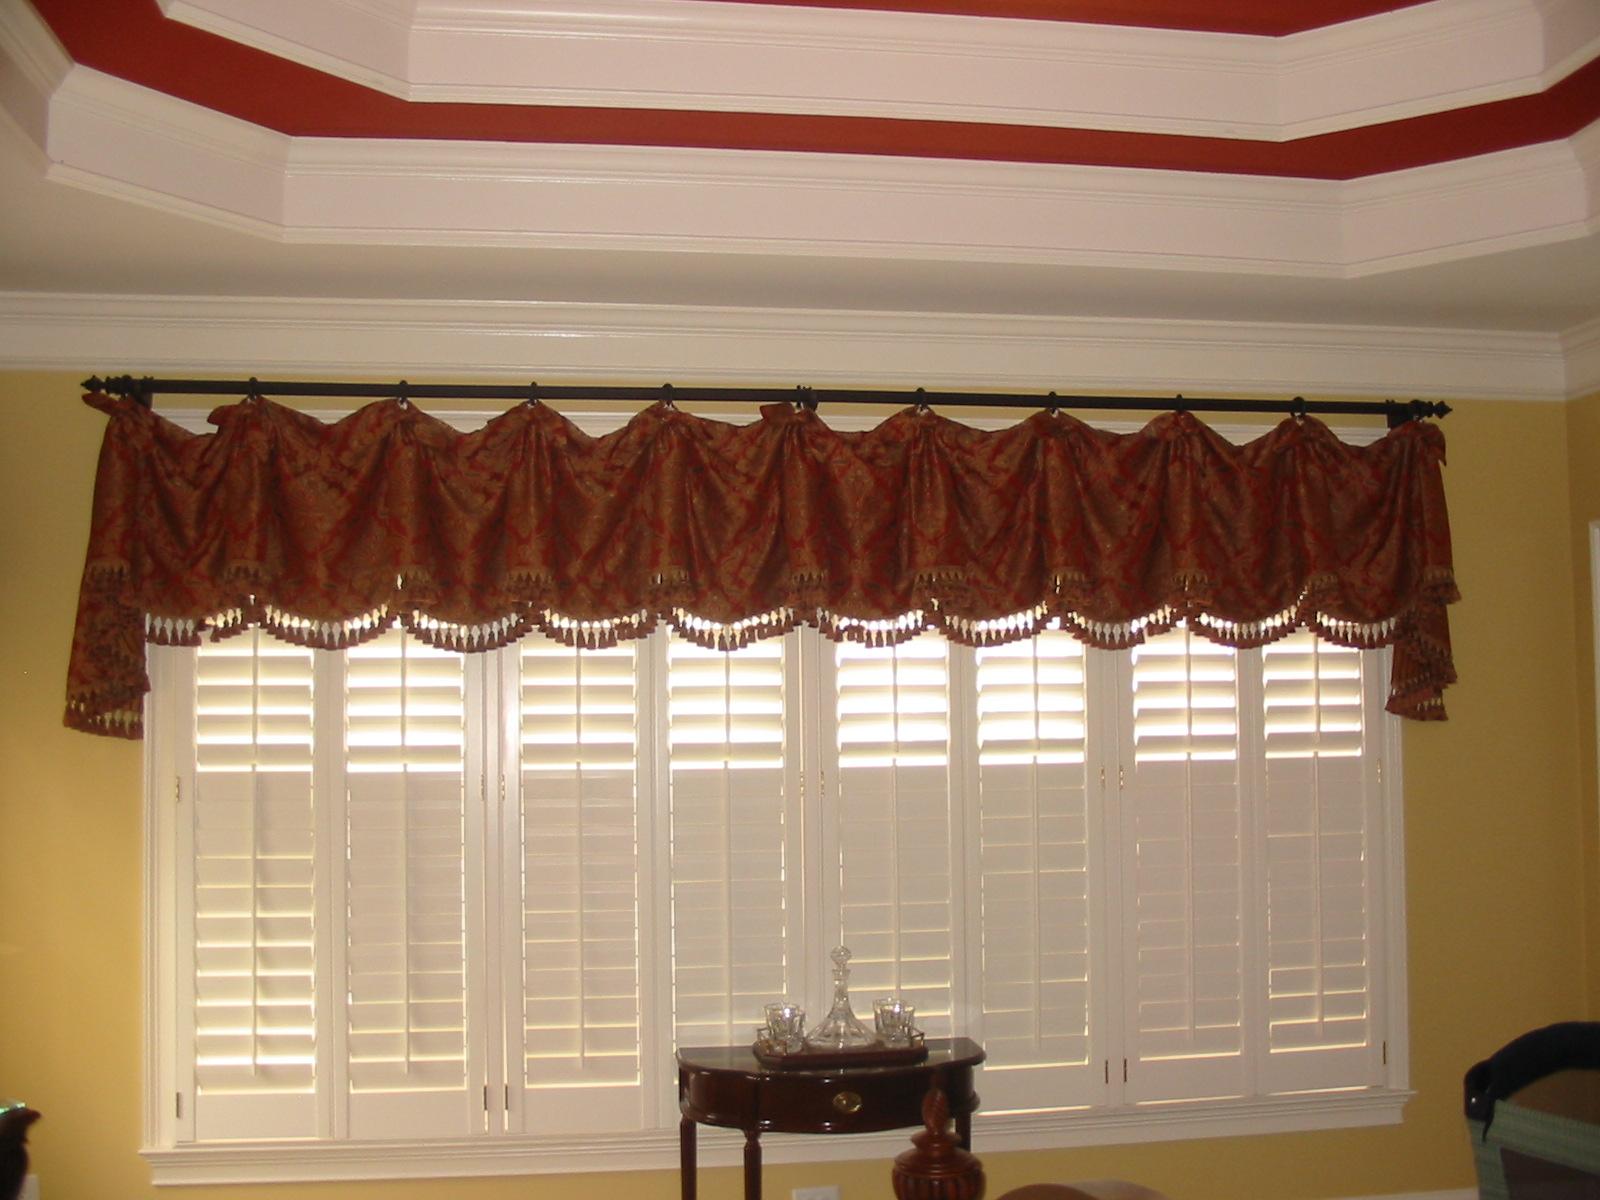 Angela thee valance most popular window treatment - Most popular window treatments ...